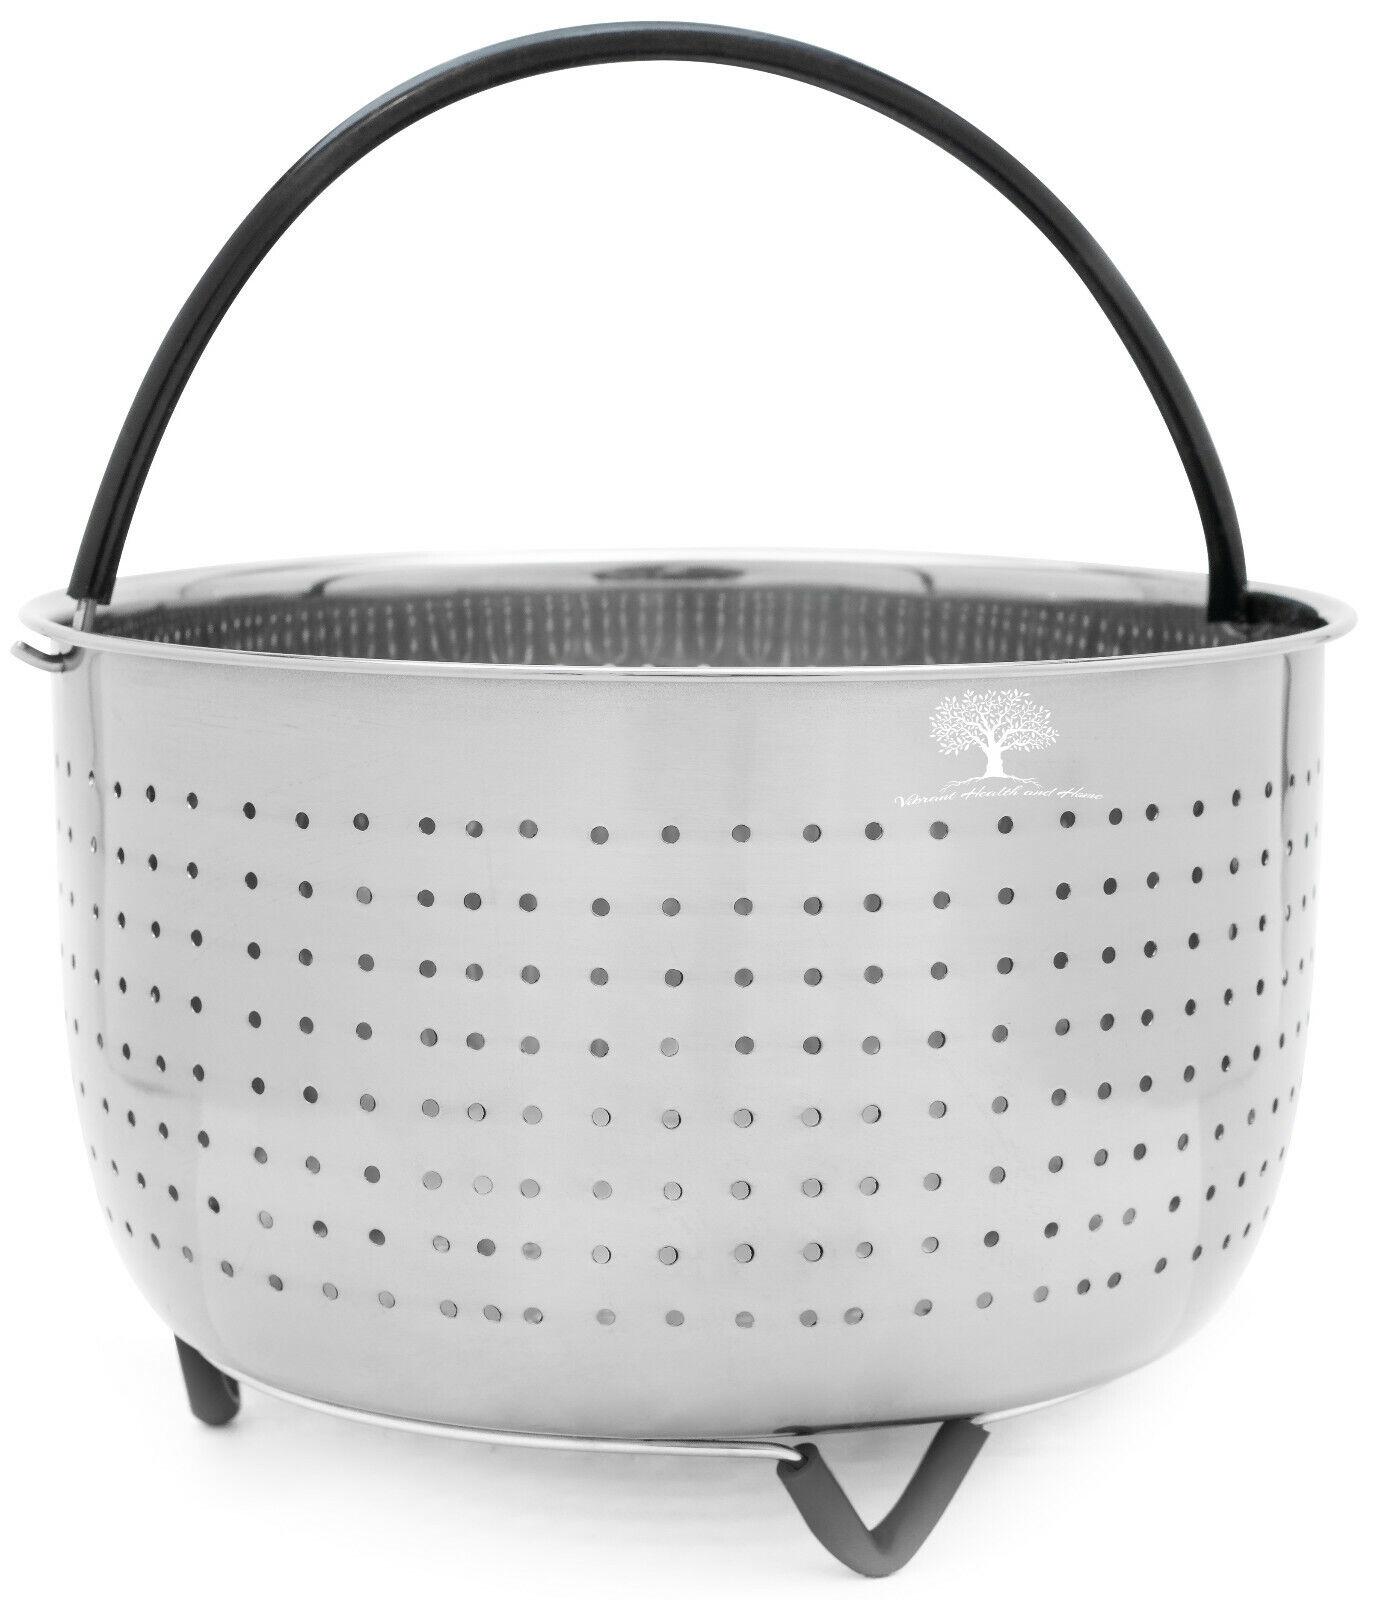 Instant Pot Accessories Steamer Basket for 6 - 8 QT Instapot